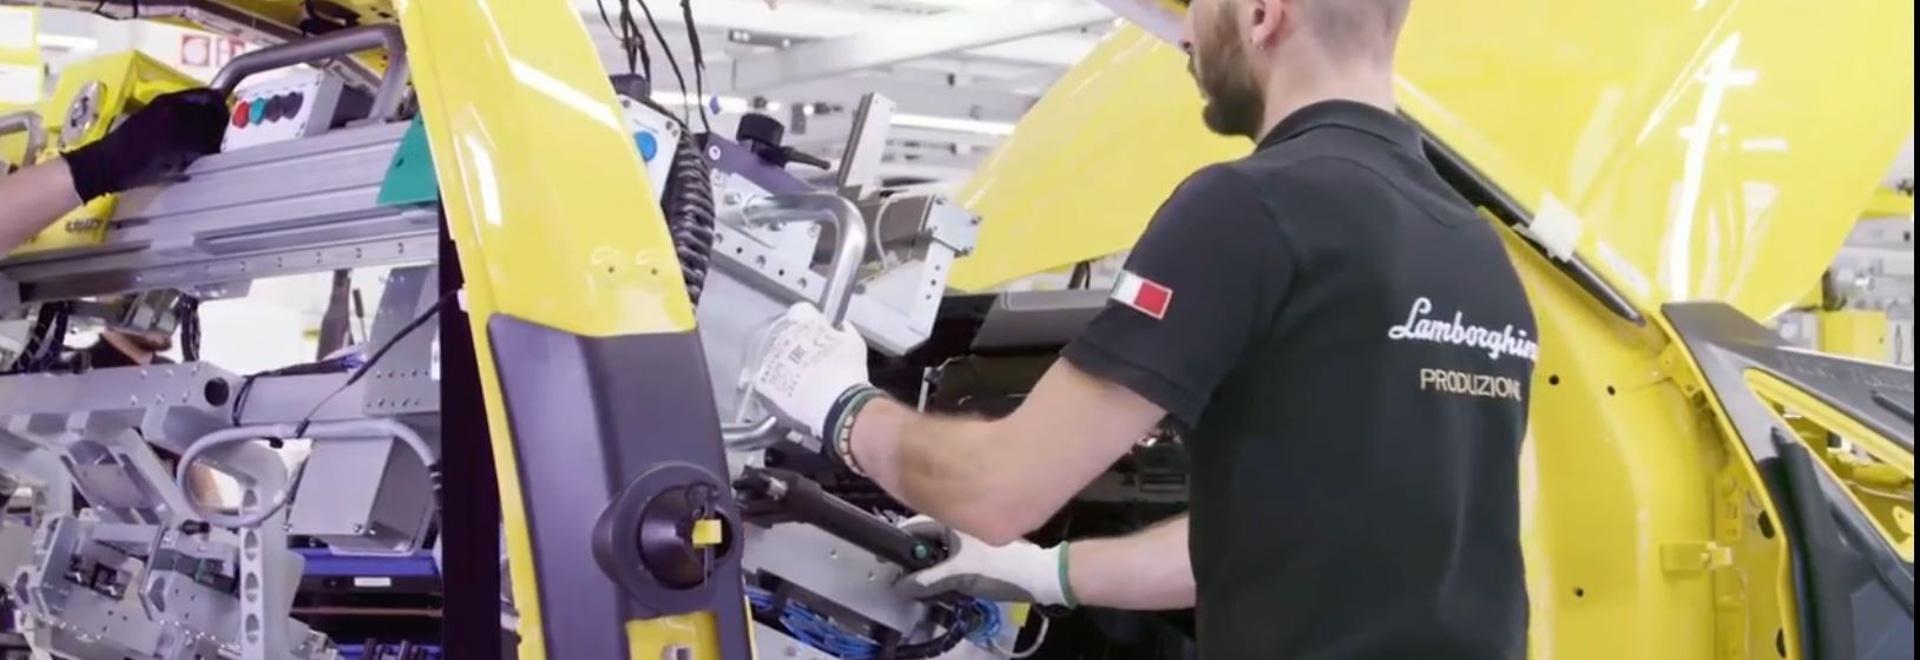 Lamborghini's URUS assembly line uses INDEVA® industrial manipulators